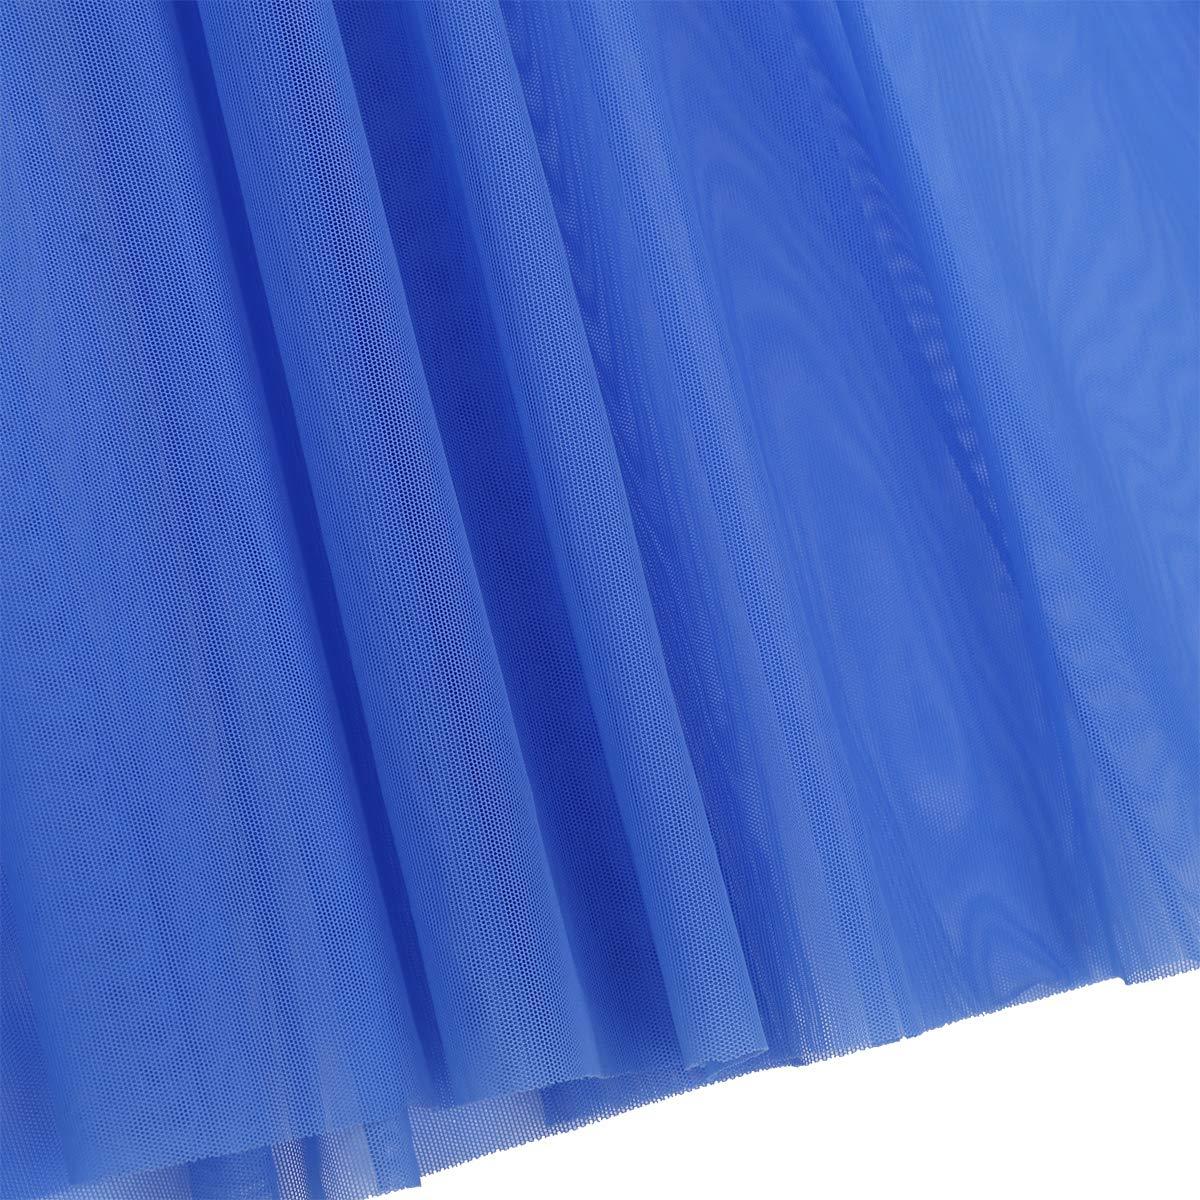 ranrann Longue Robe Danse Classique Justaucorps Fille Enfant Robe Danse Latine Jazz Rumba Zumba Salsa Cancan Dancewear Mock Neck Robe Soir/ée Coctail Bal Performance 8-16 Ans